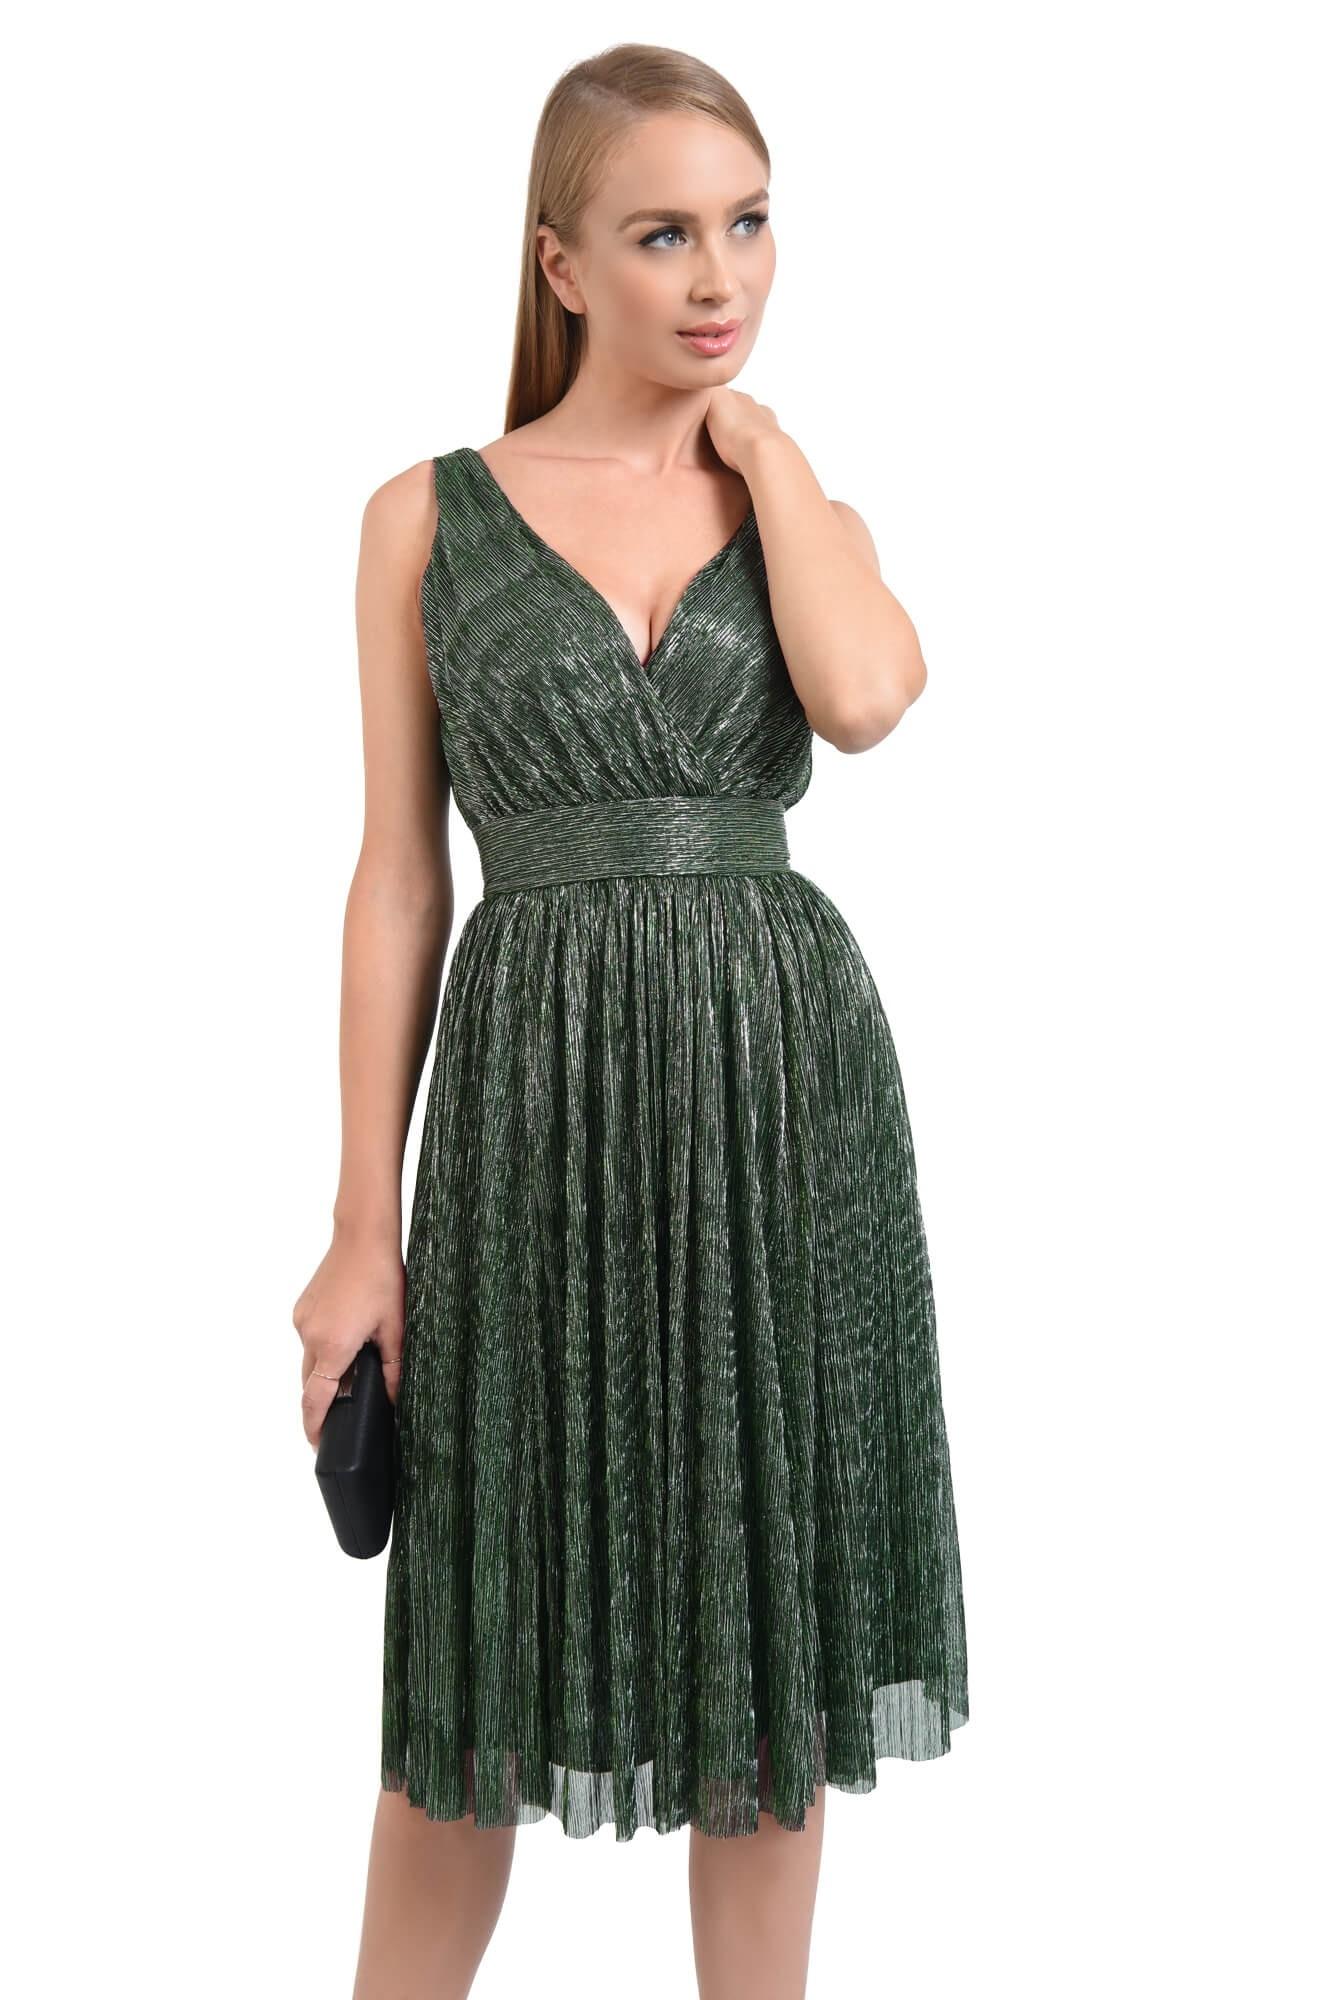 0 - rochie de seara, clos, betelie lata, decolteu anchior, verde